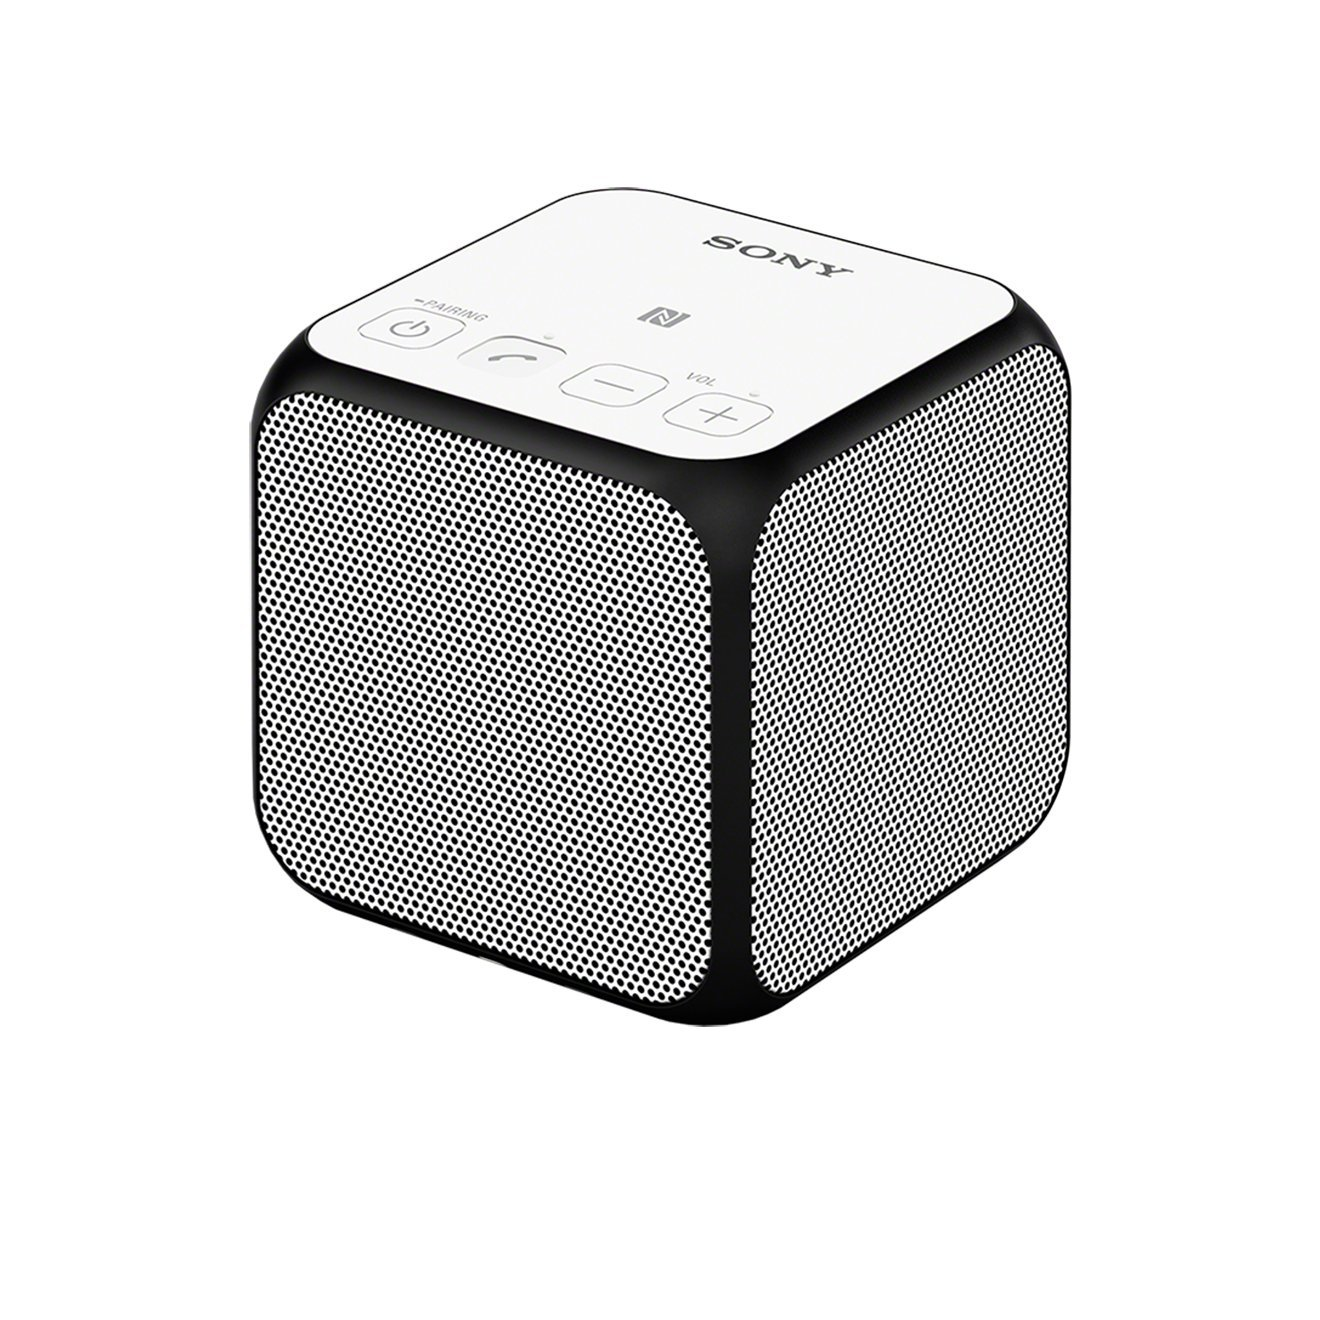 Sony SRS X Altavoz inalámbrico portátil compacto de W Bluetooth NFC blanco